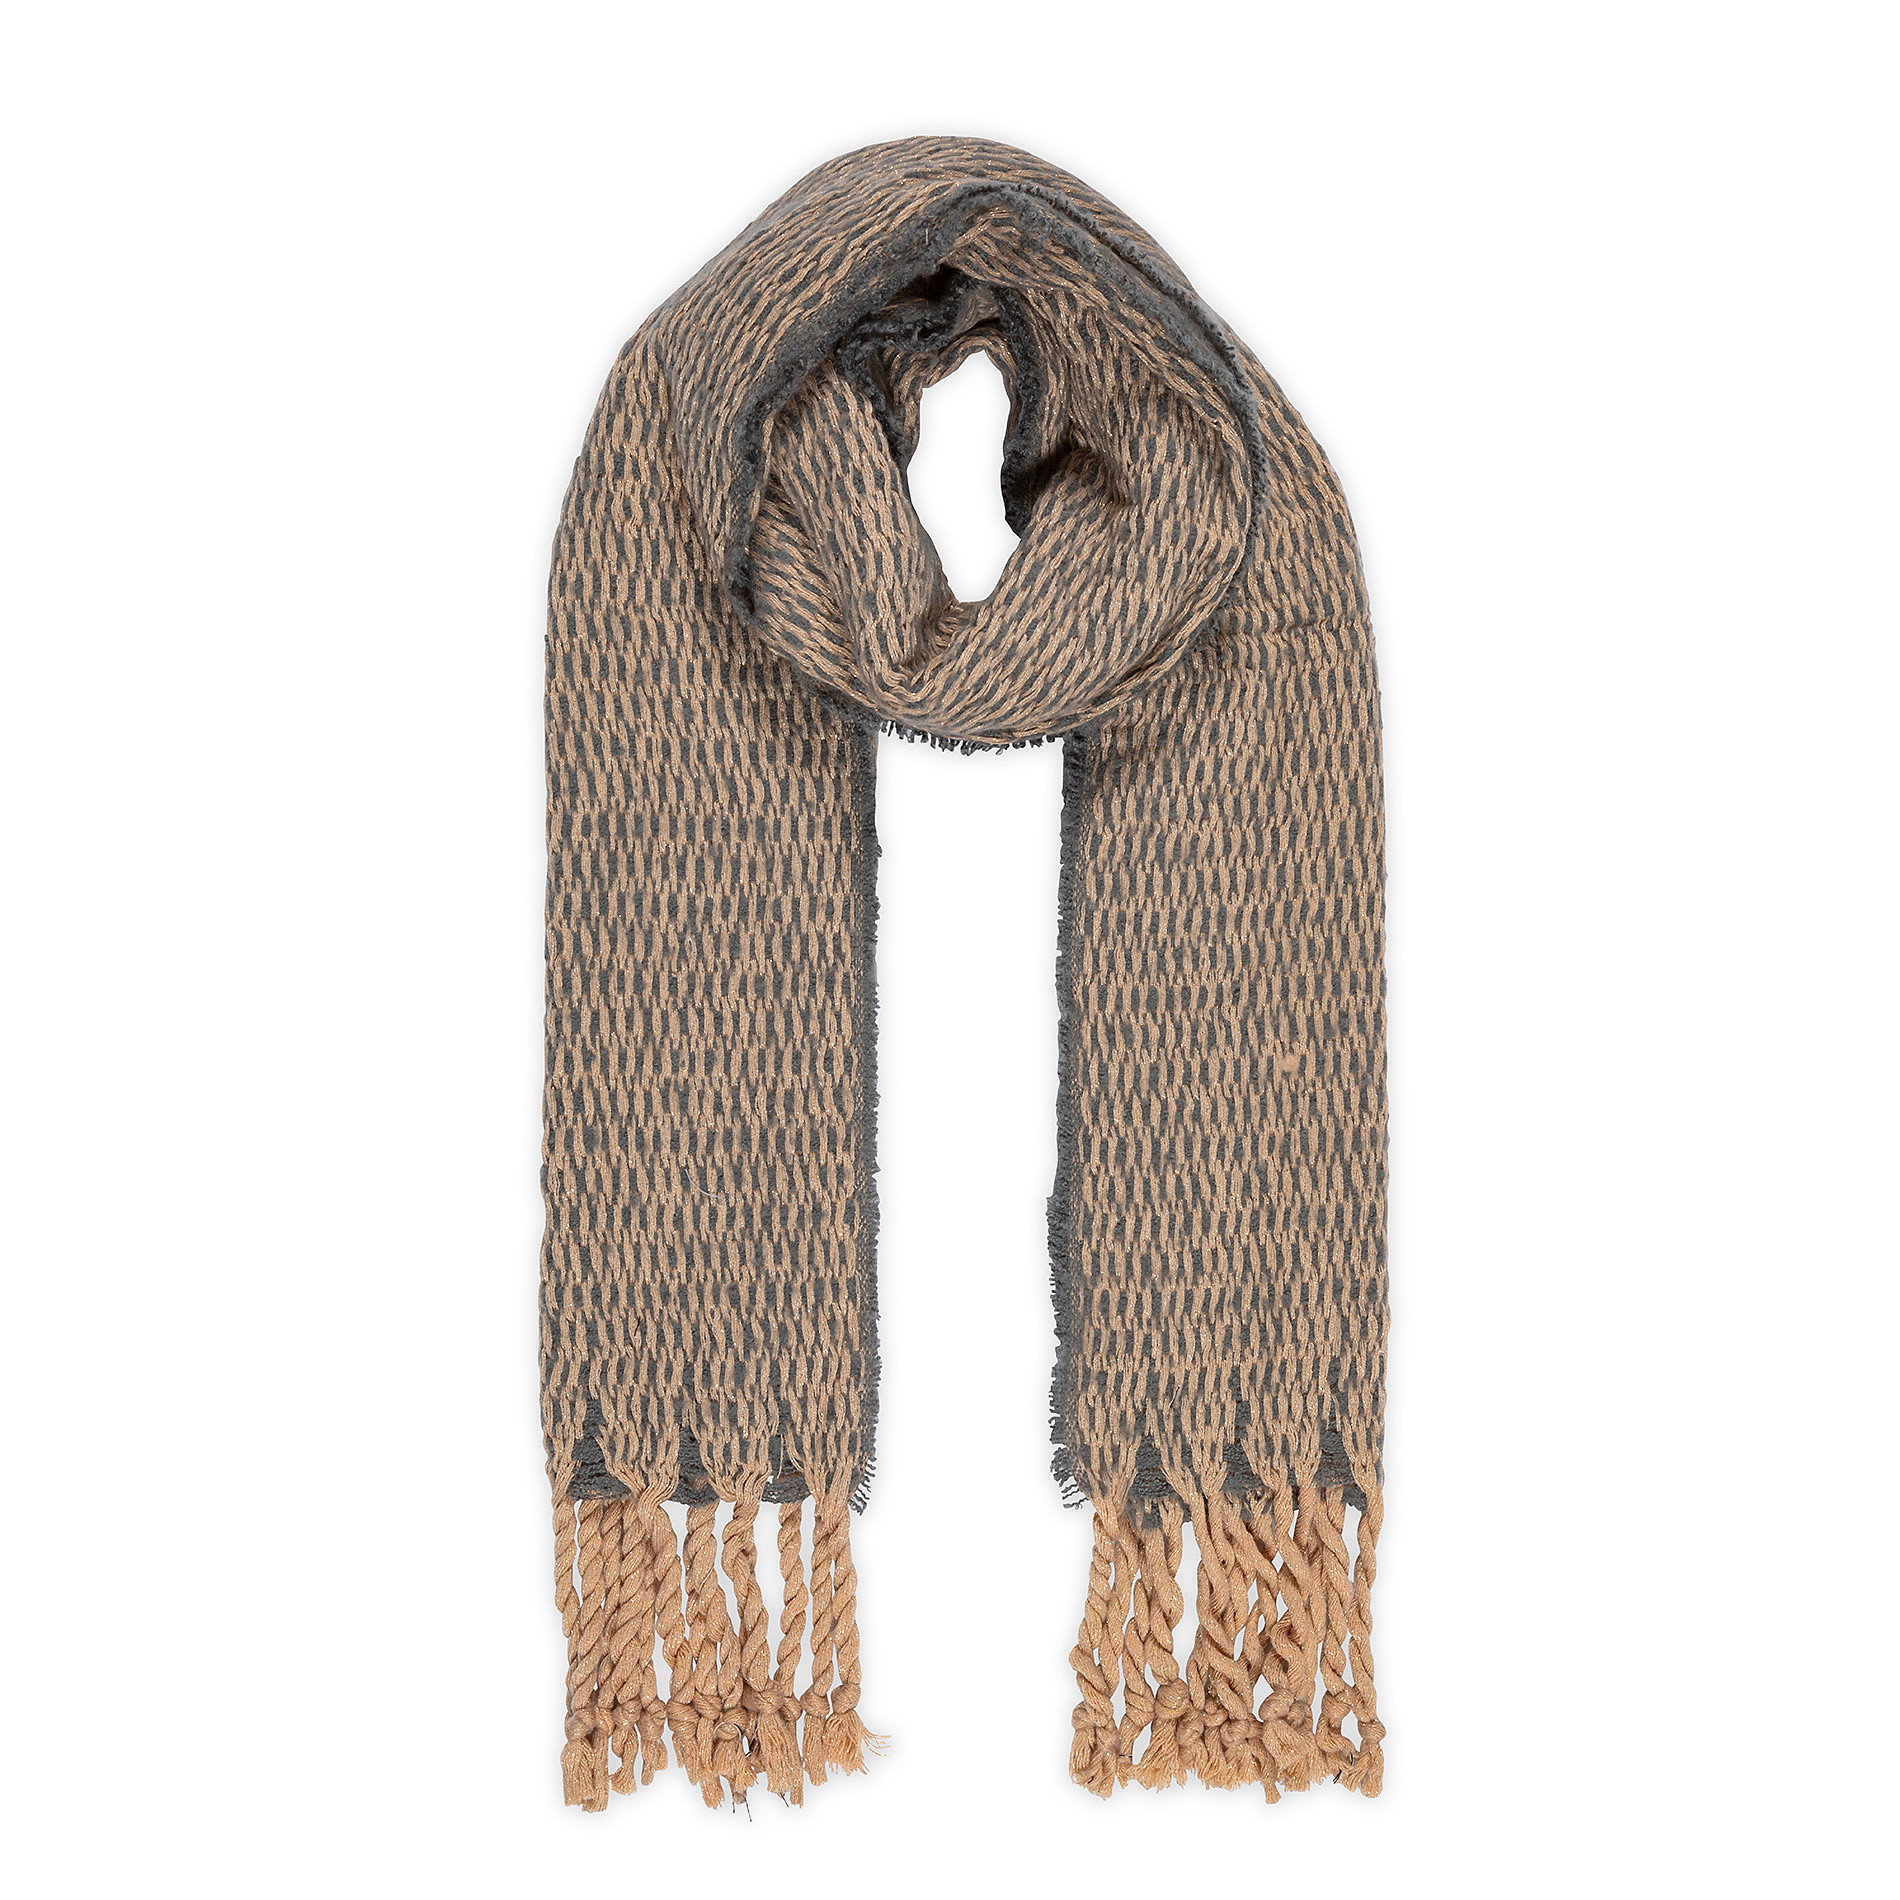 Sciarpa tessuto a maglia Koan, Grigio, large image number 0